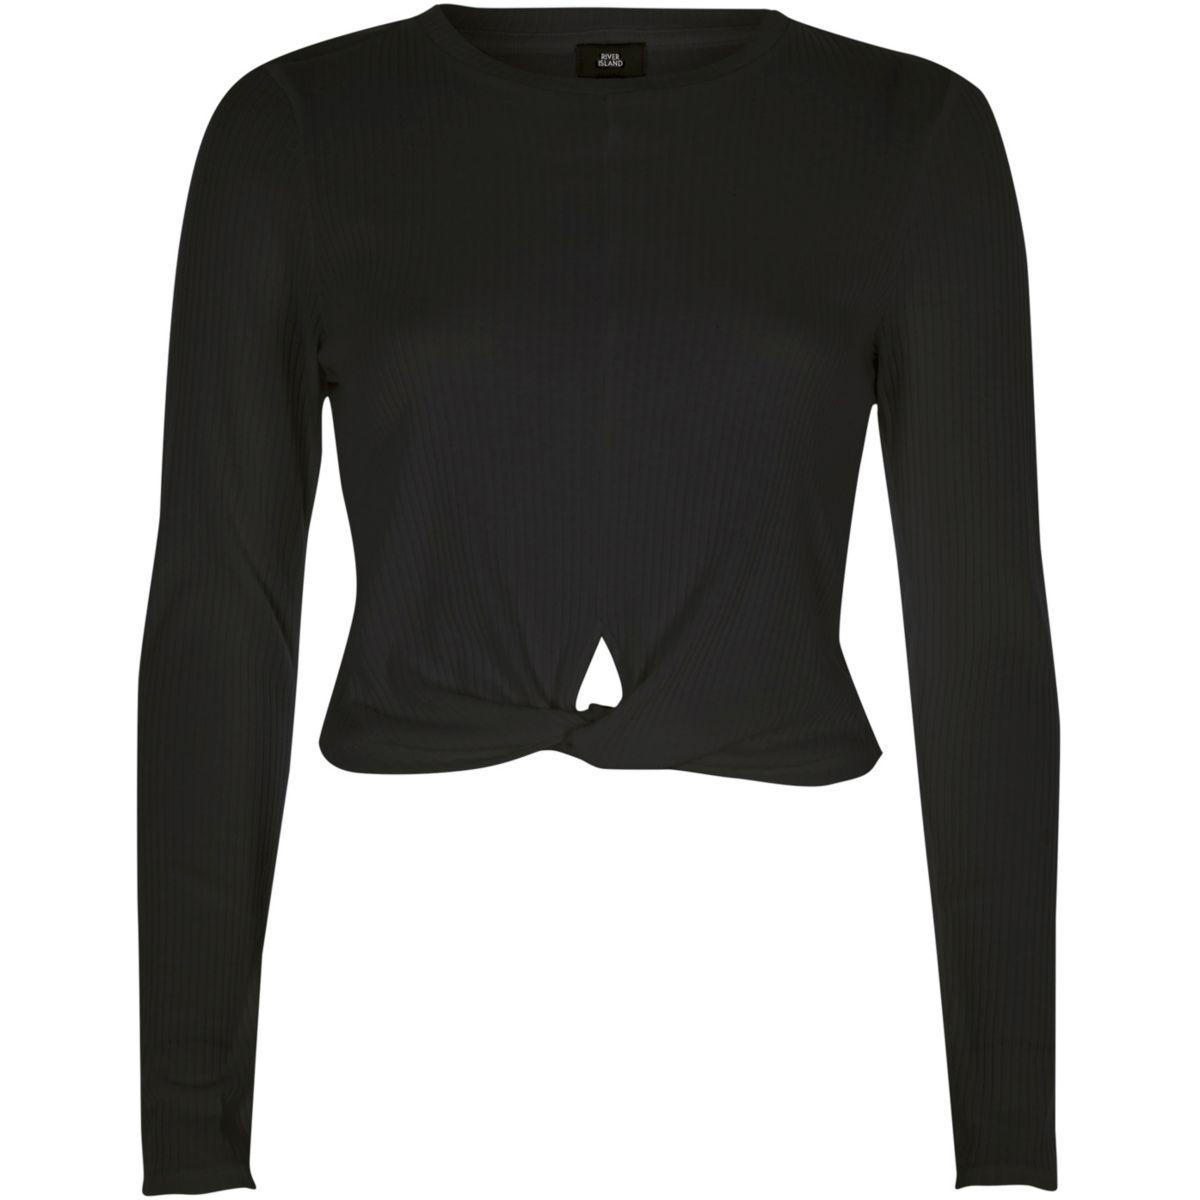 Black twist front long sleeve crop top